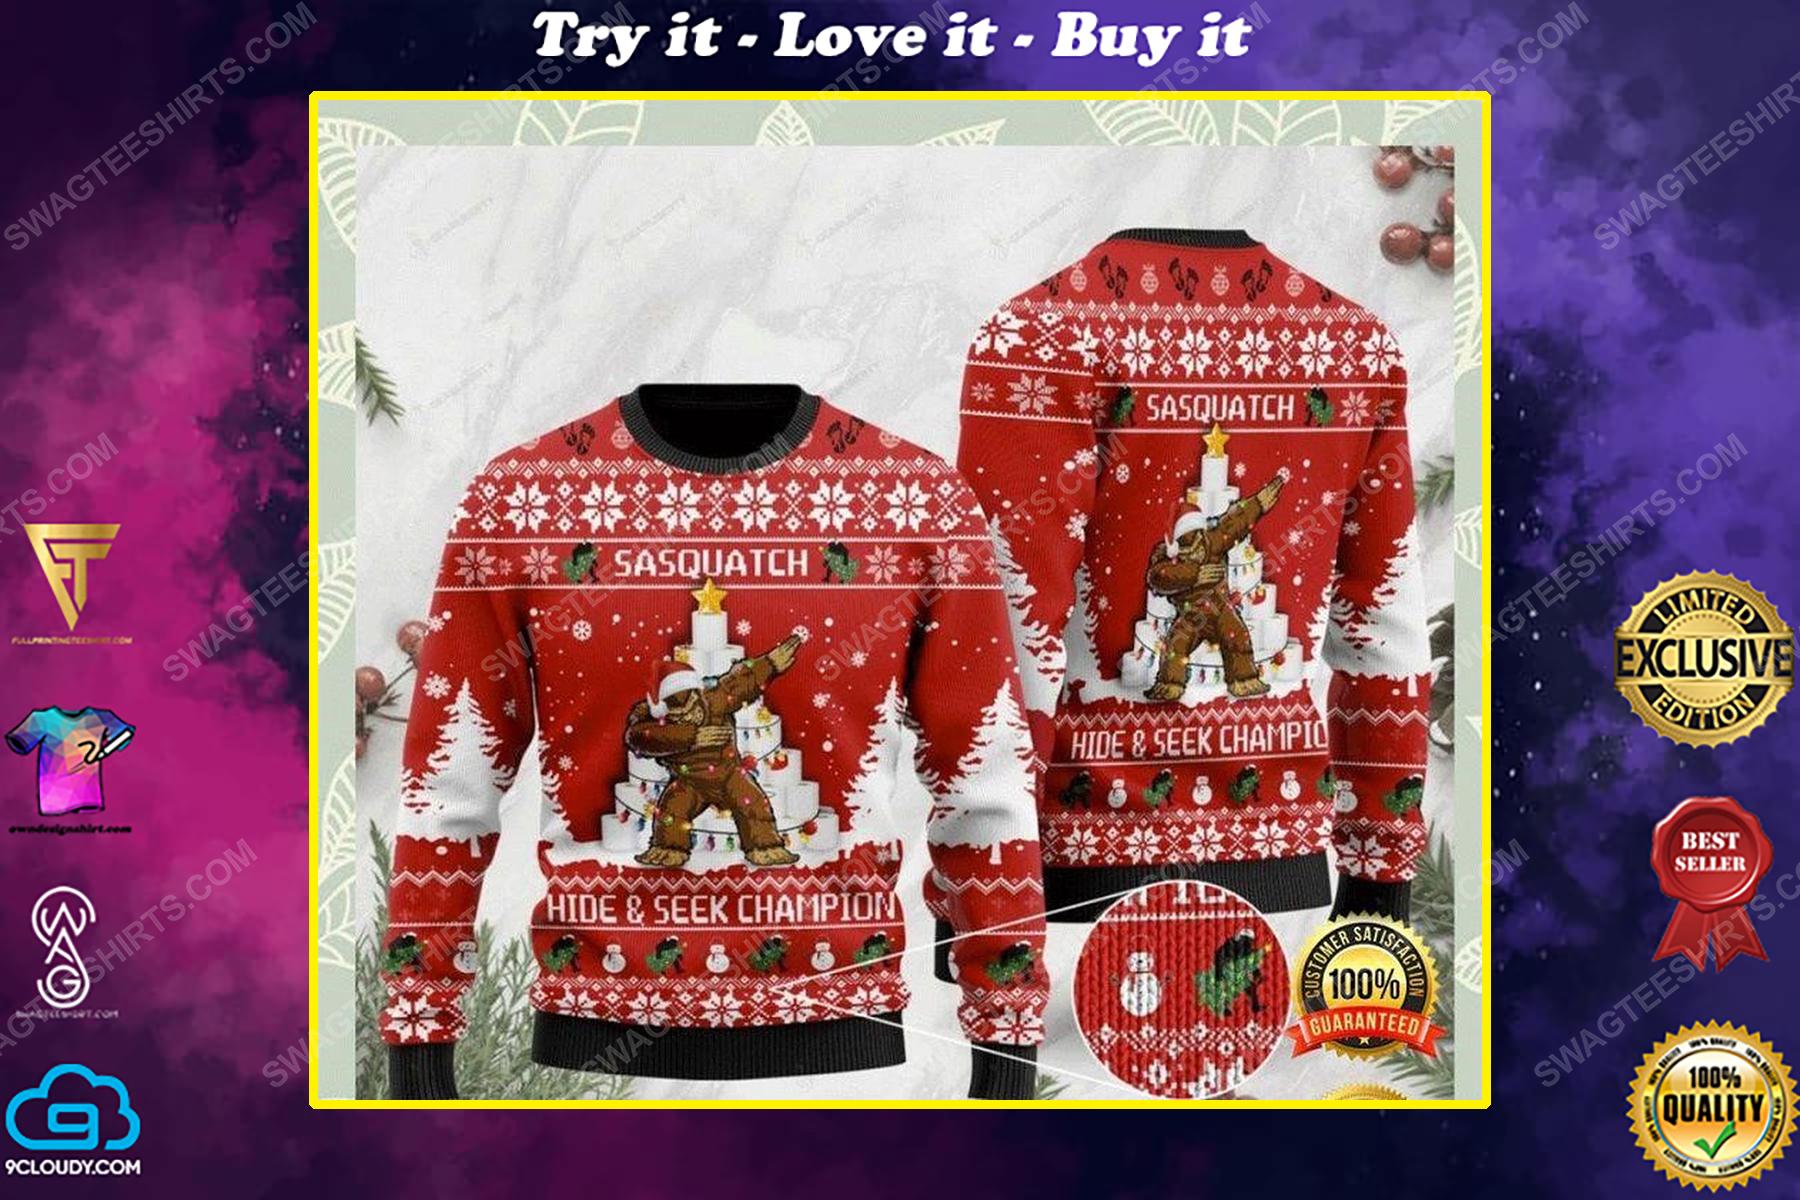 Sasquatch bigfoot hide and seek champion ugly christmas sweater